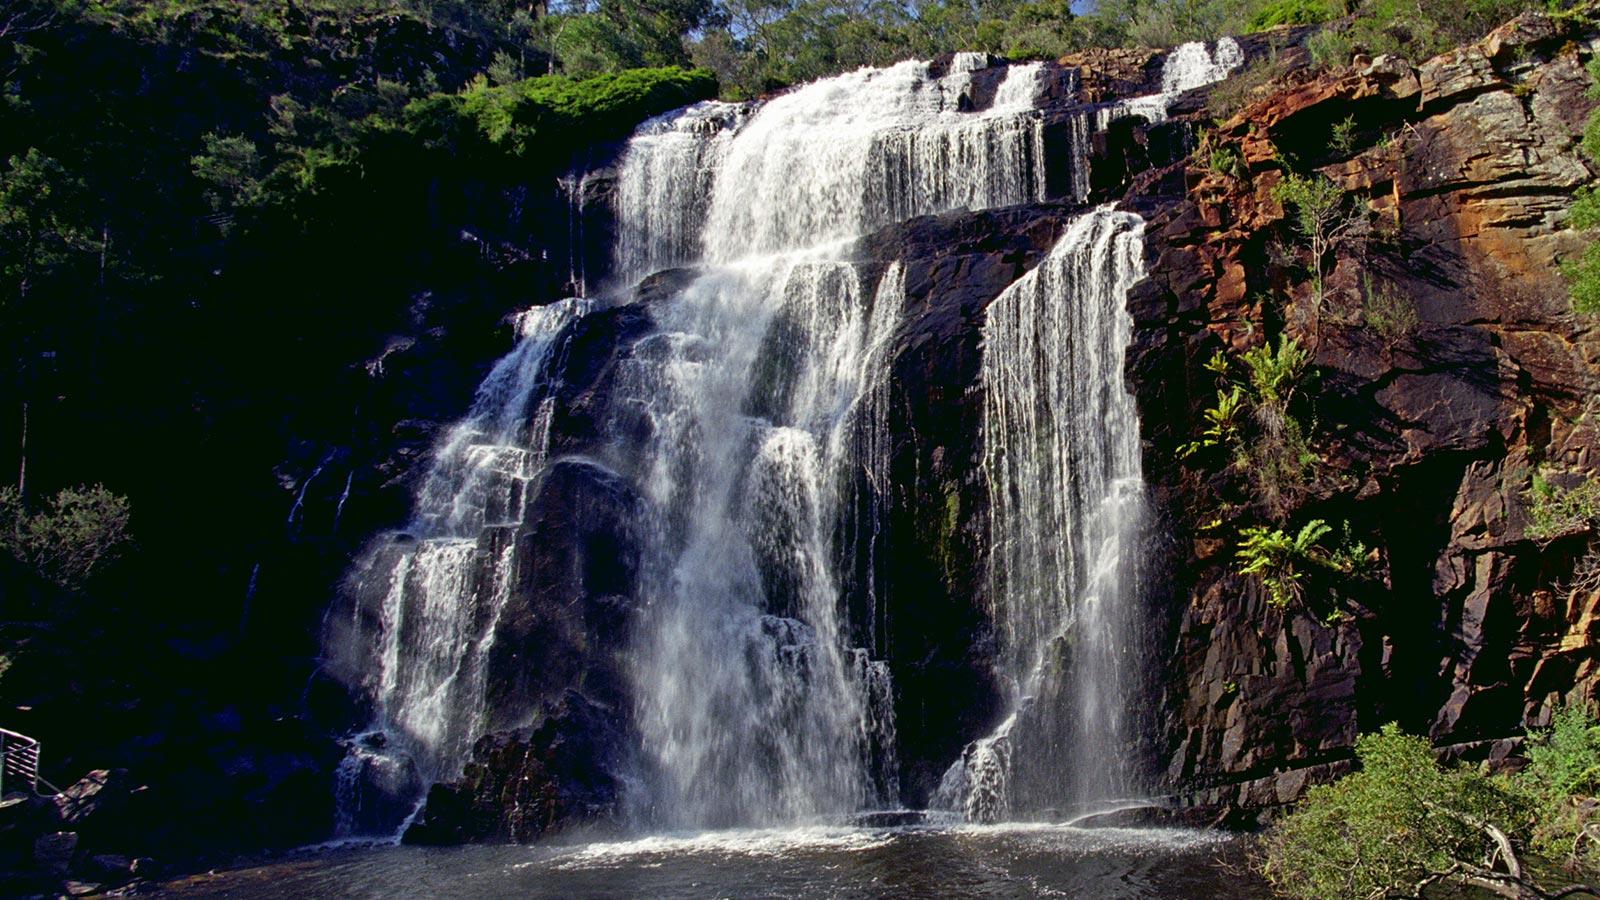 MacKenzie Falls, Grampians National Park, Grampians, Victoria, Australia